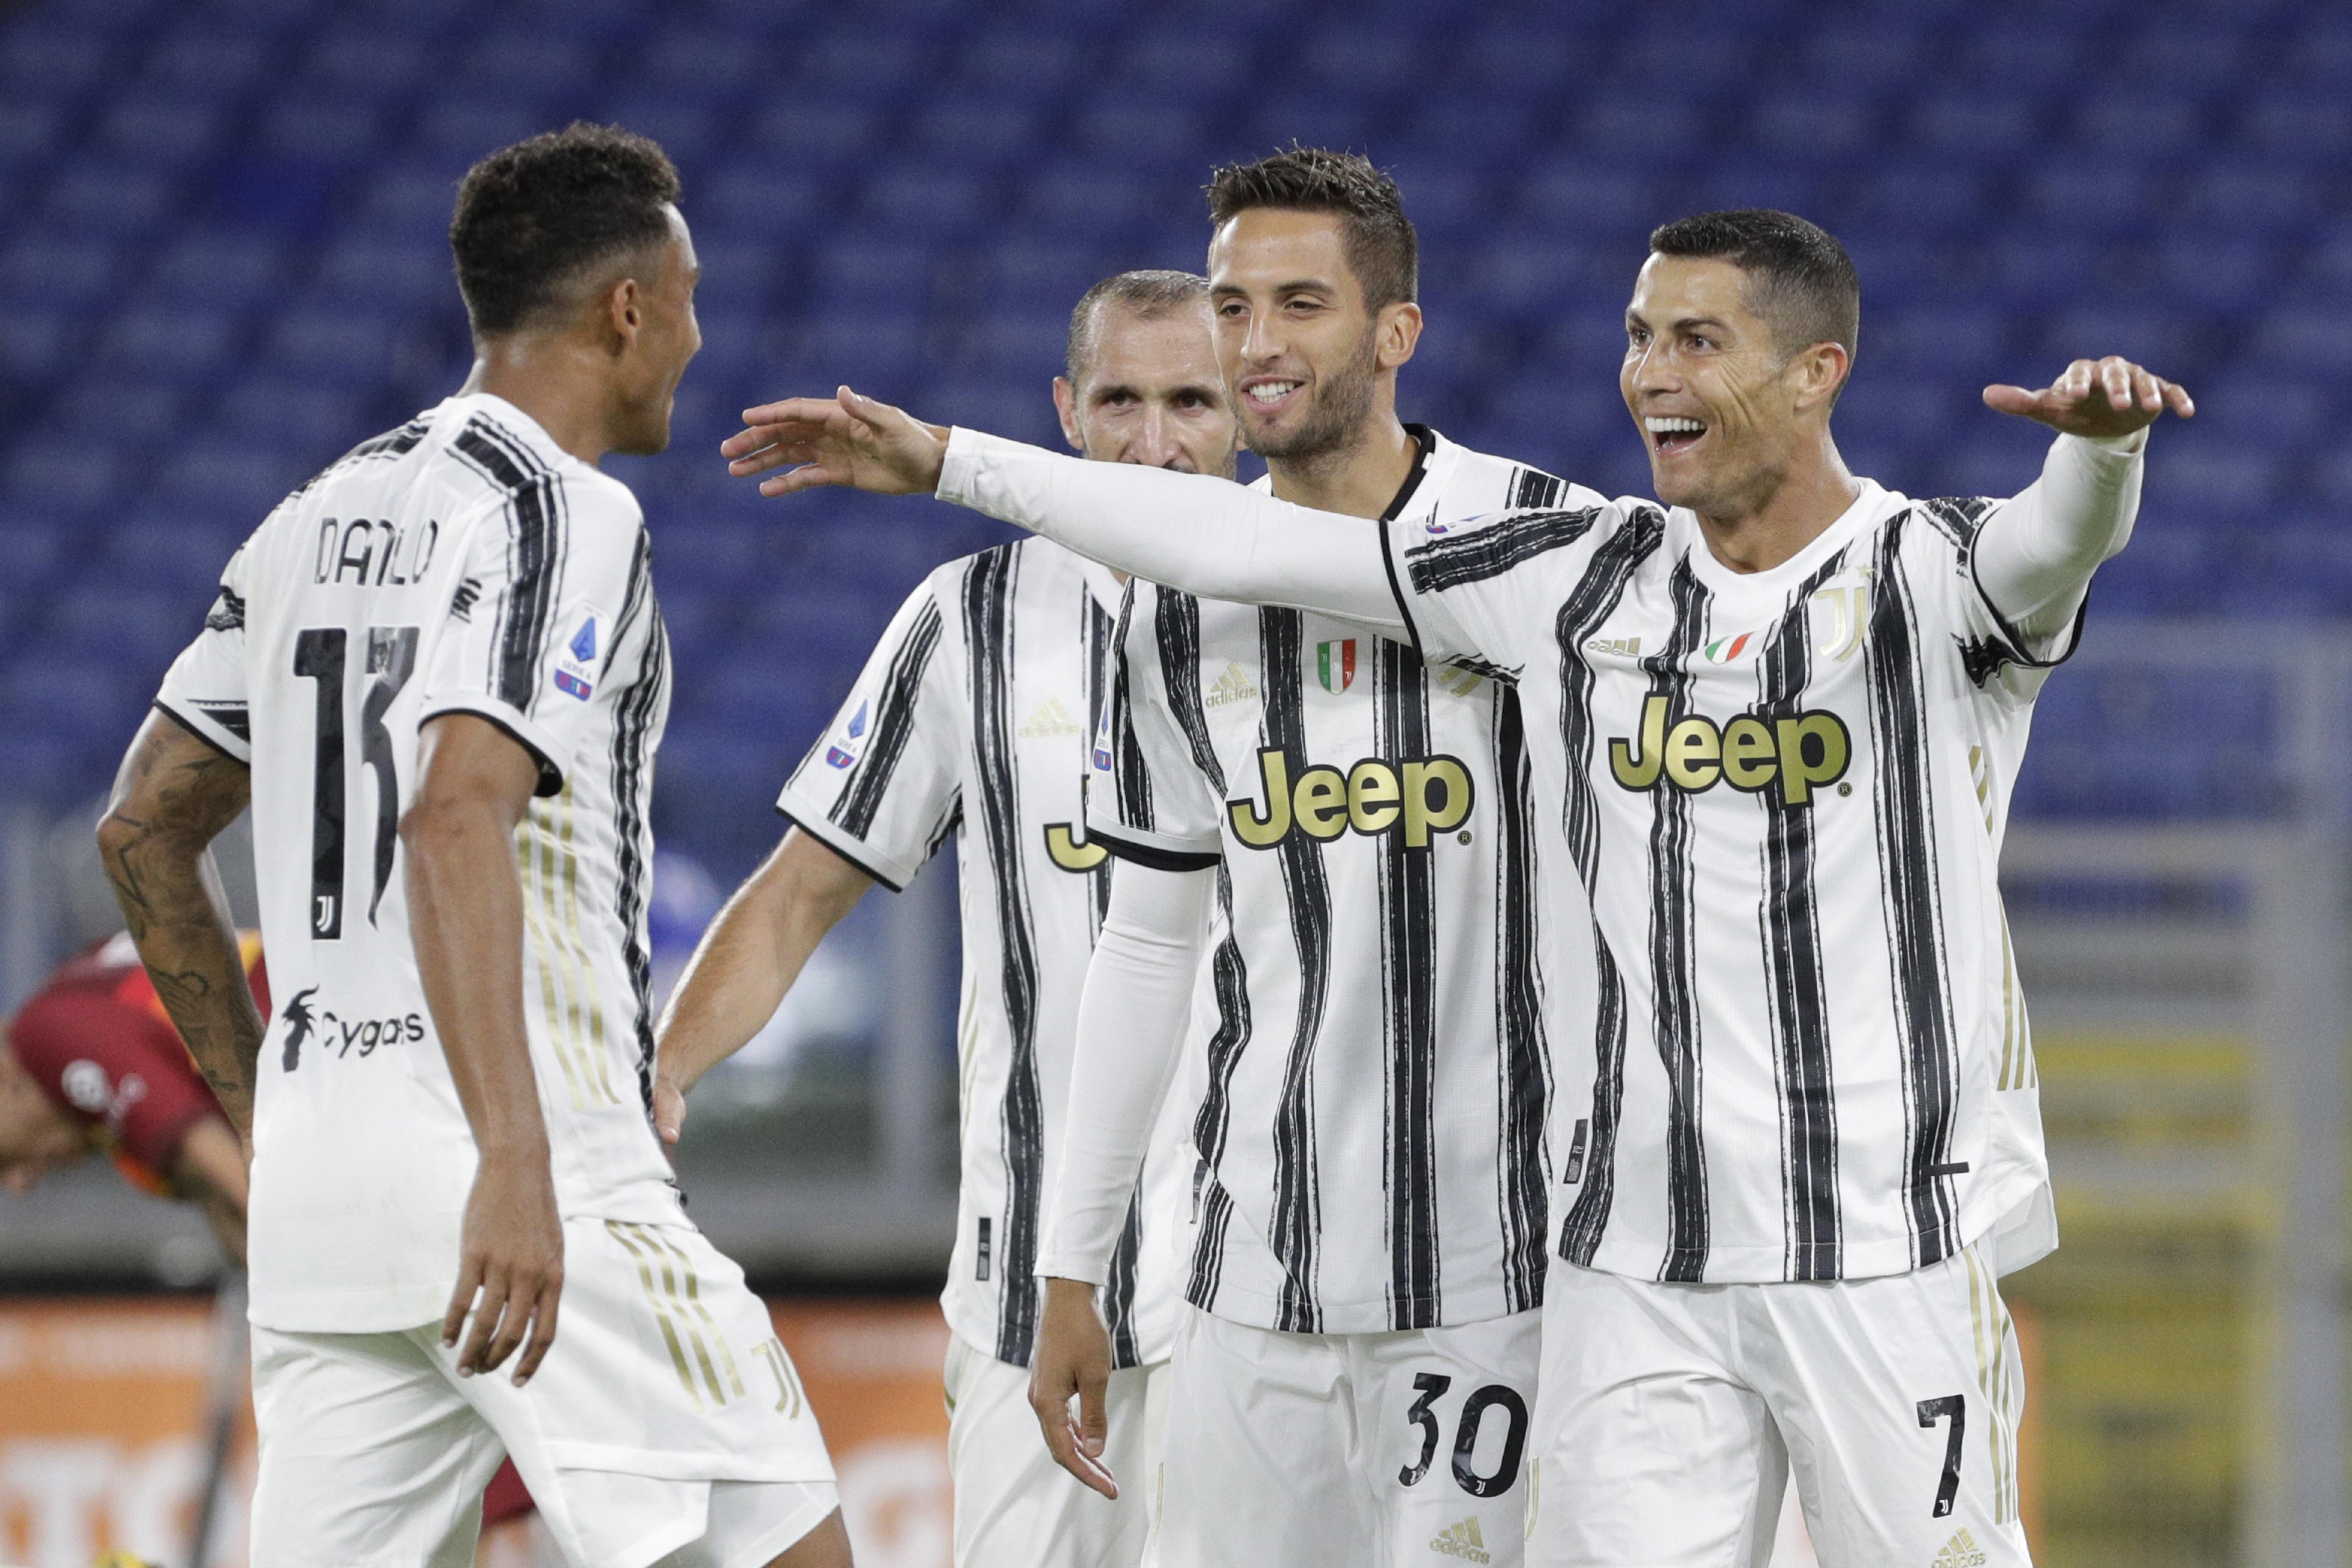 Juventus Vs Napoli Live Stream 10 4 20 Watch Cristiano Ronaldo In Serie A Online Time Usa Tv Channel Nj Com